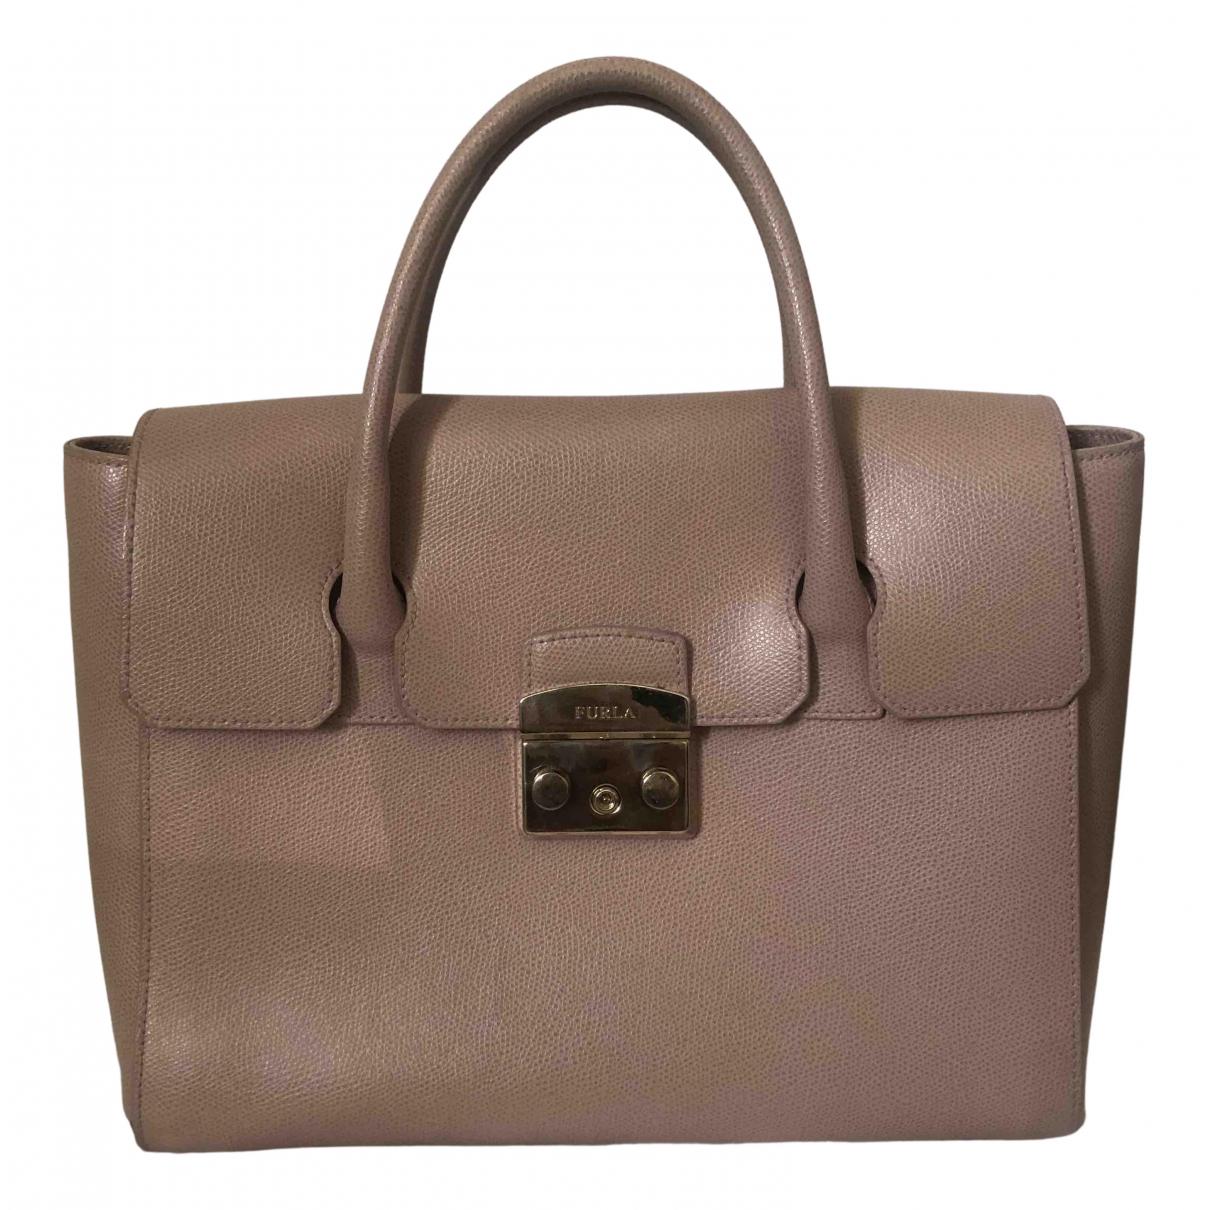 Furla Metropolis Pink Leather handbag for Women N